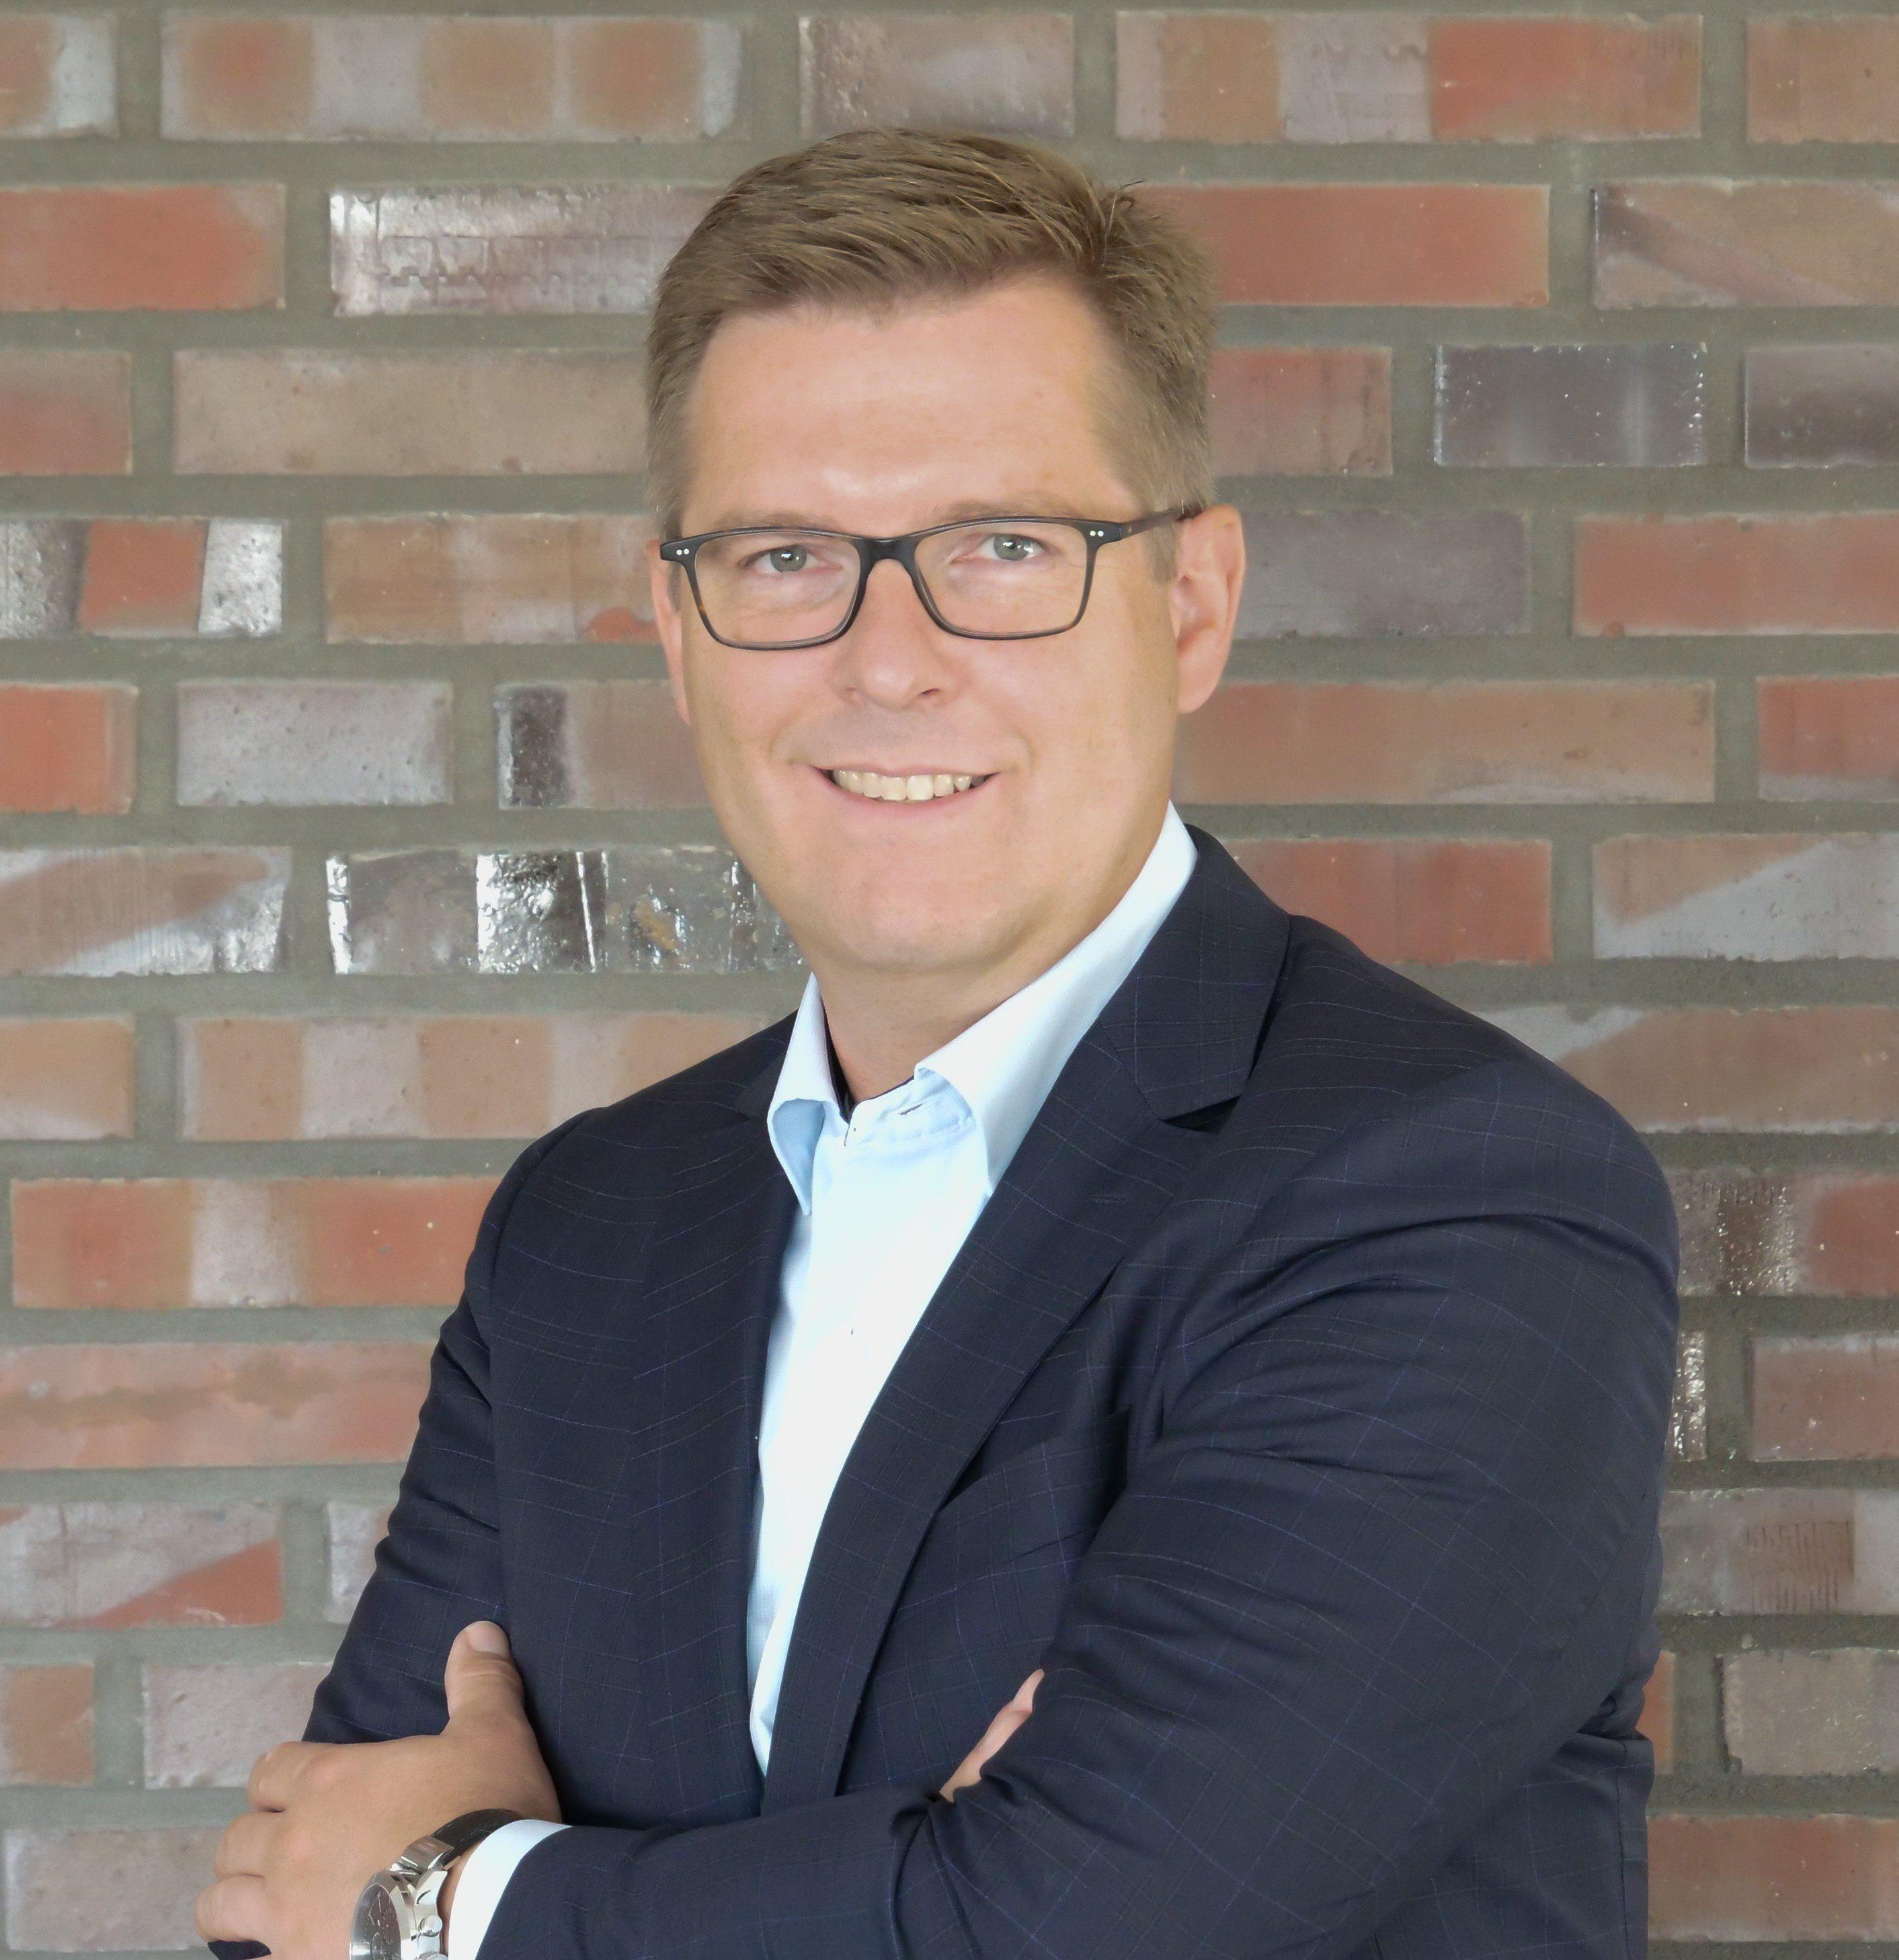 Thomas Flügel